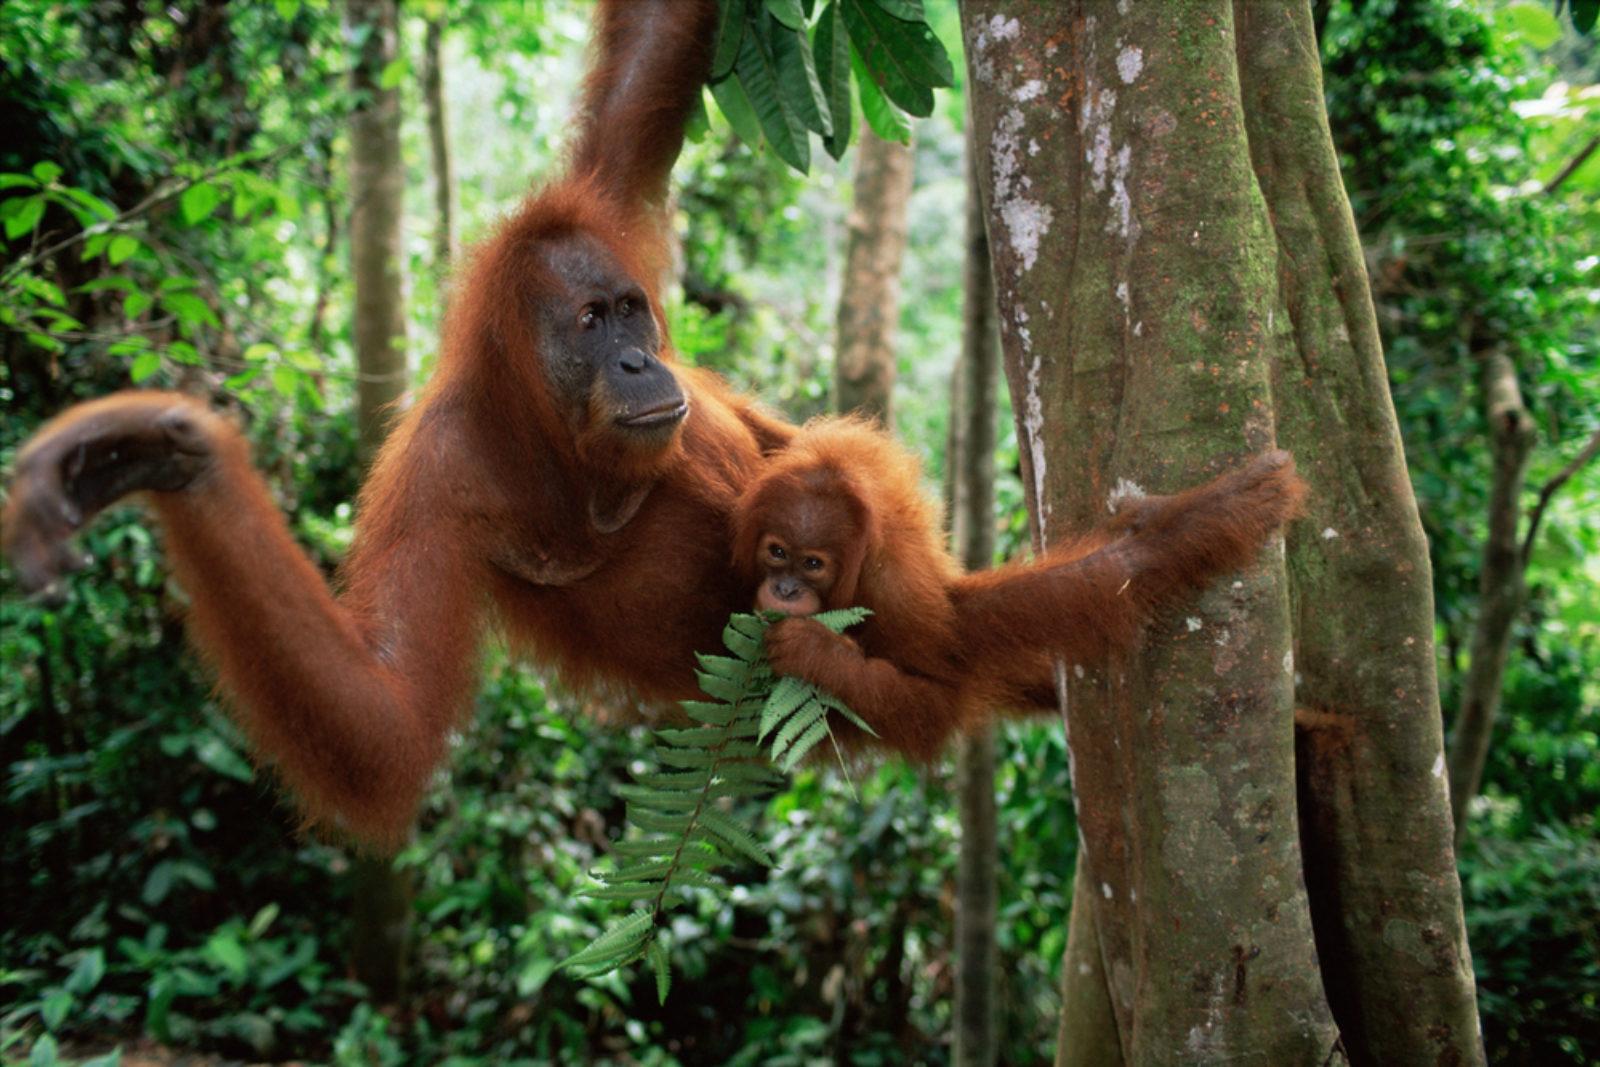 En sumatraorangutang svinger seg i trærne med en unge på magen